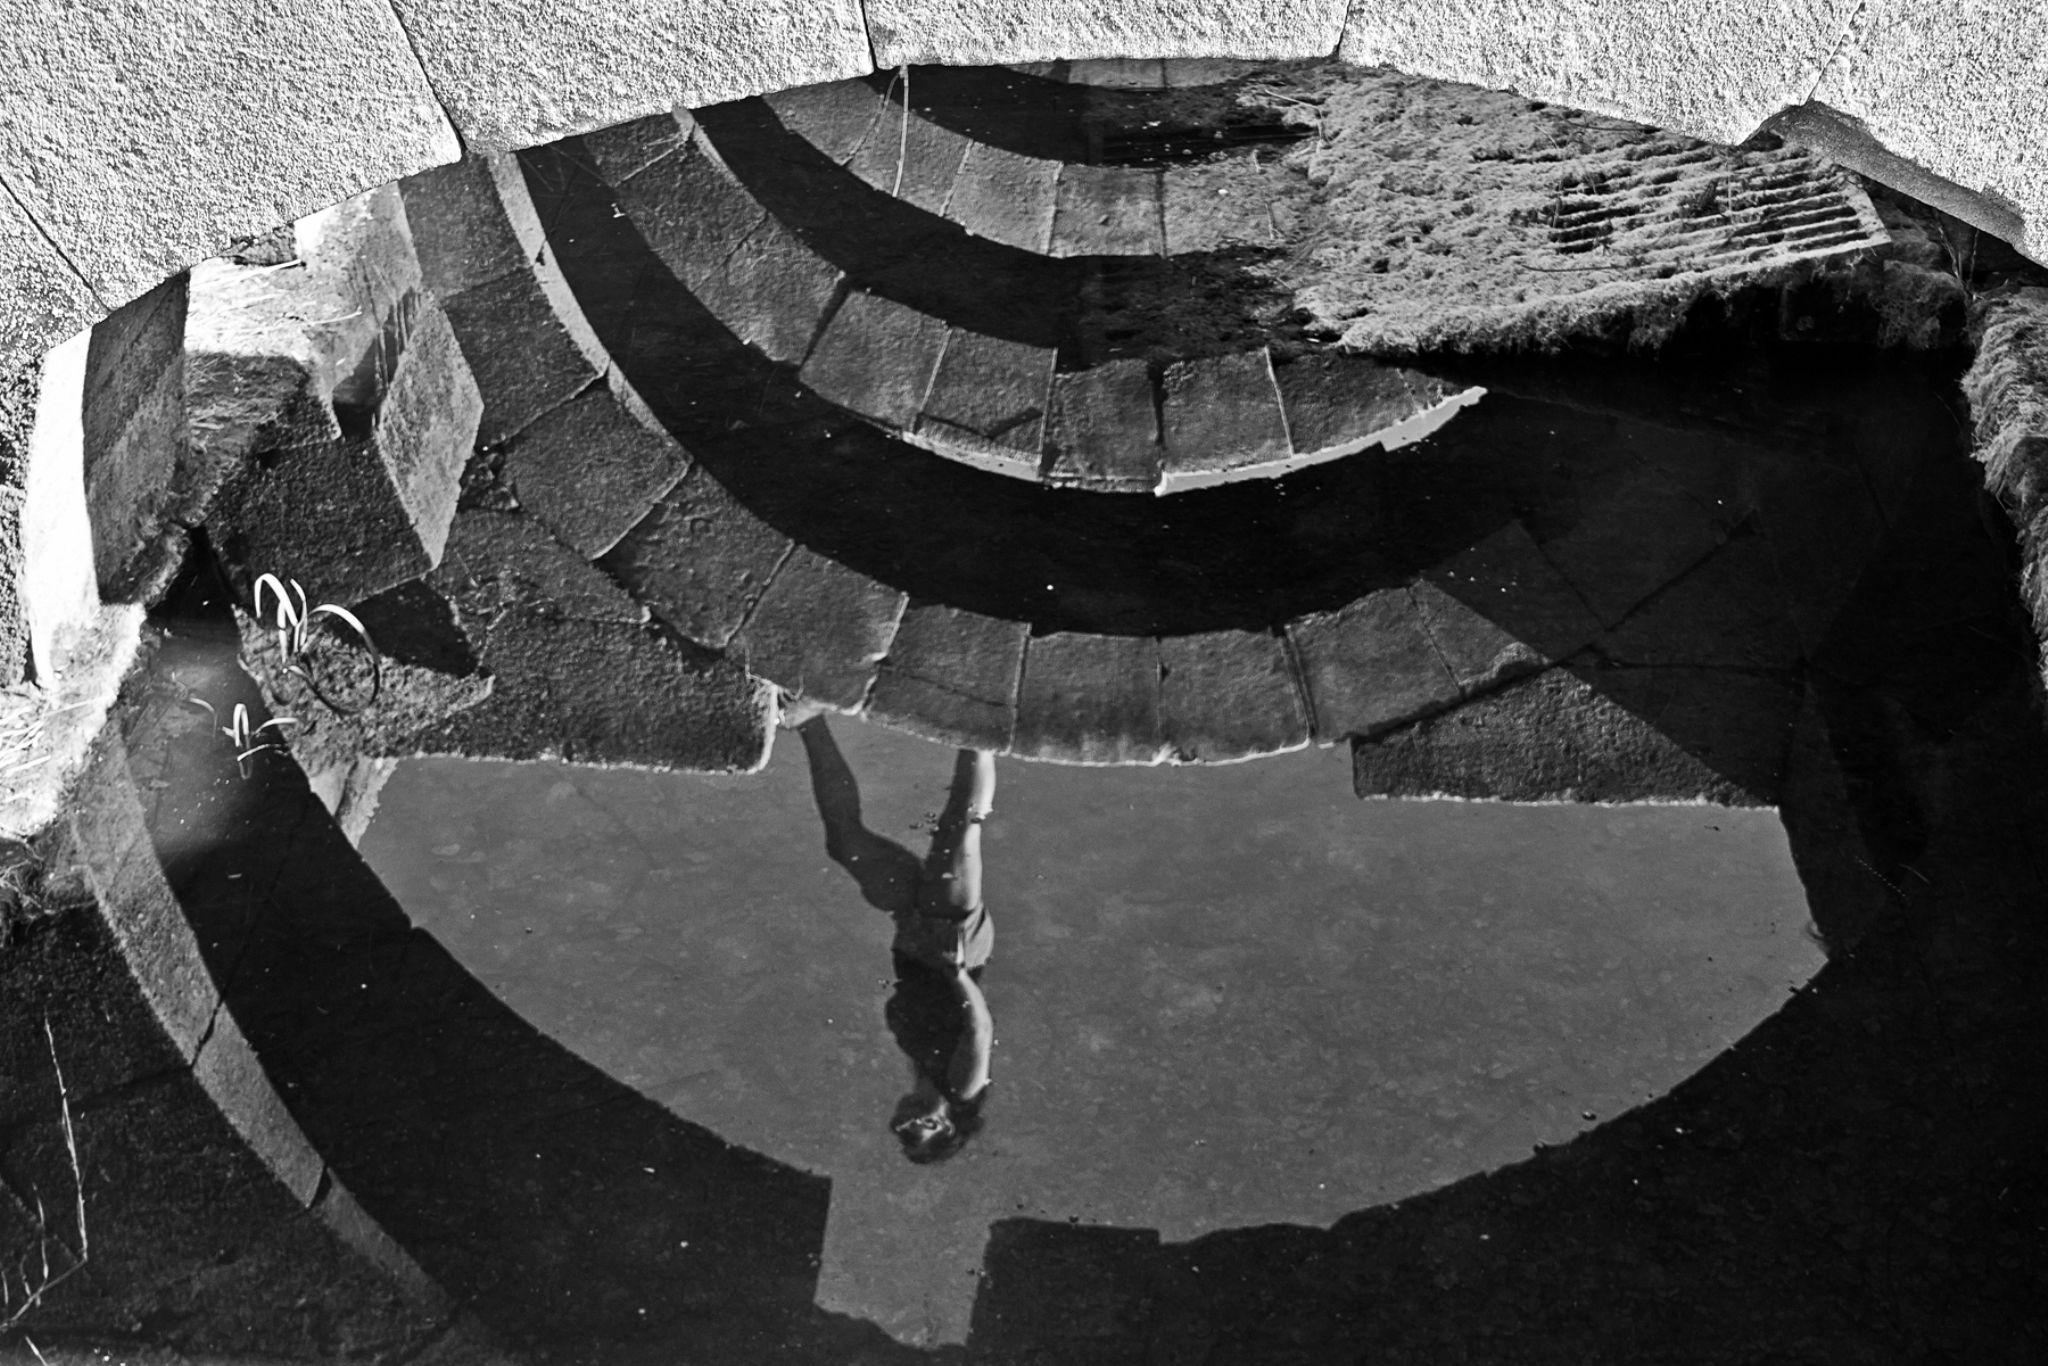 Yansıma ( Reflection ) by Suleyman Bilgen